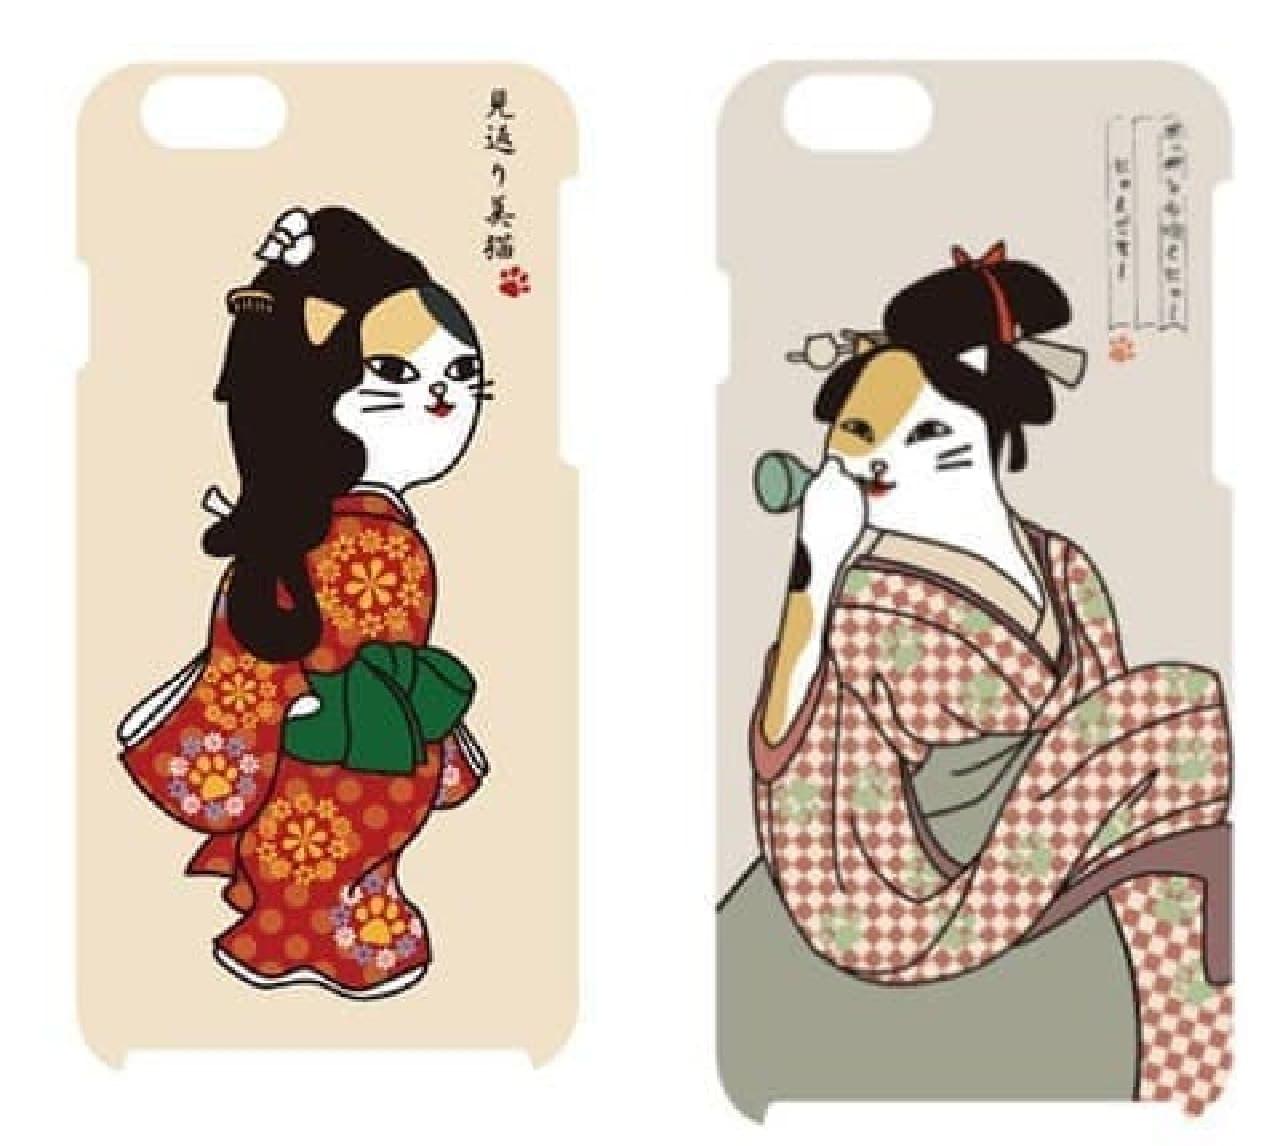 iPhone 6 用スマホケース「見返り美猫 Ver.」(左)と「ポッペンを吹く猫 Ver.」(右)